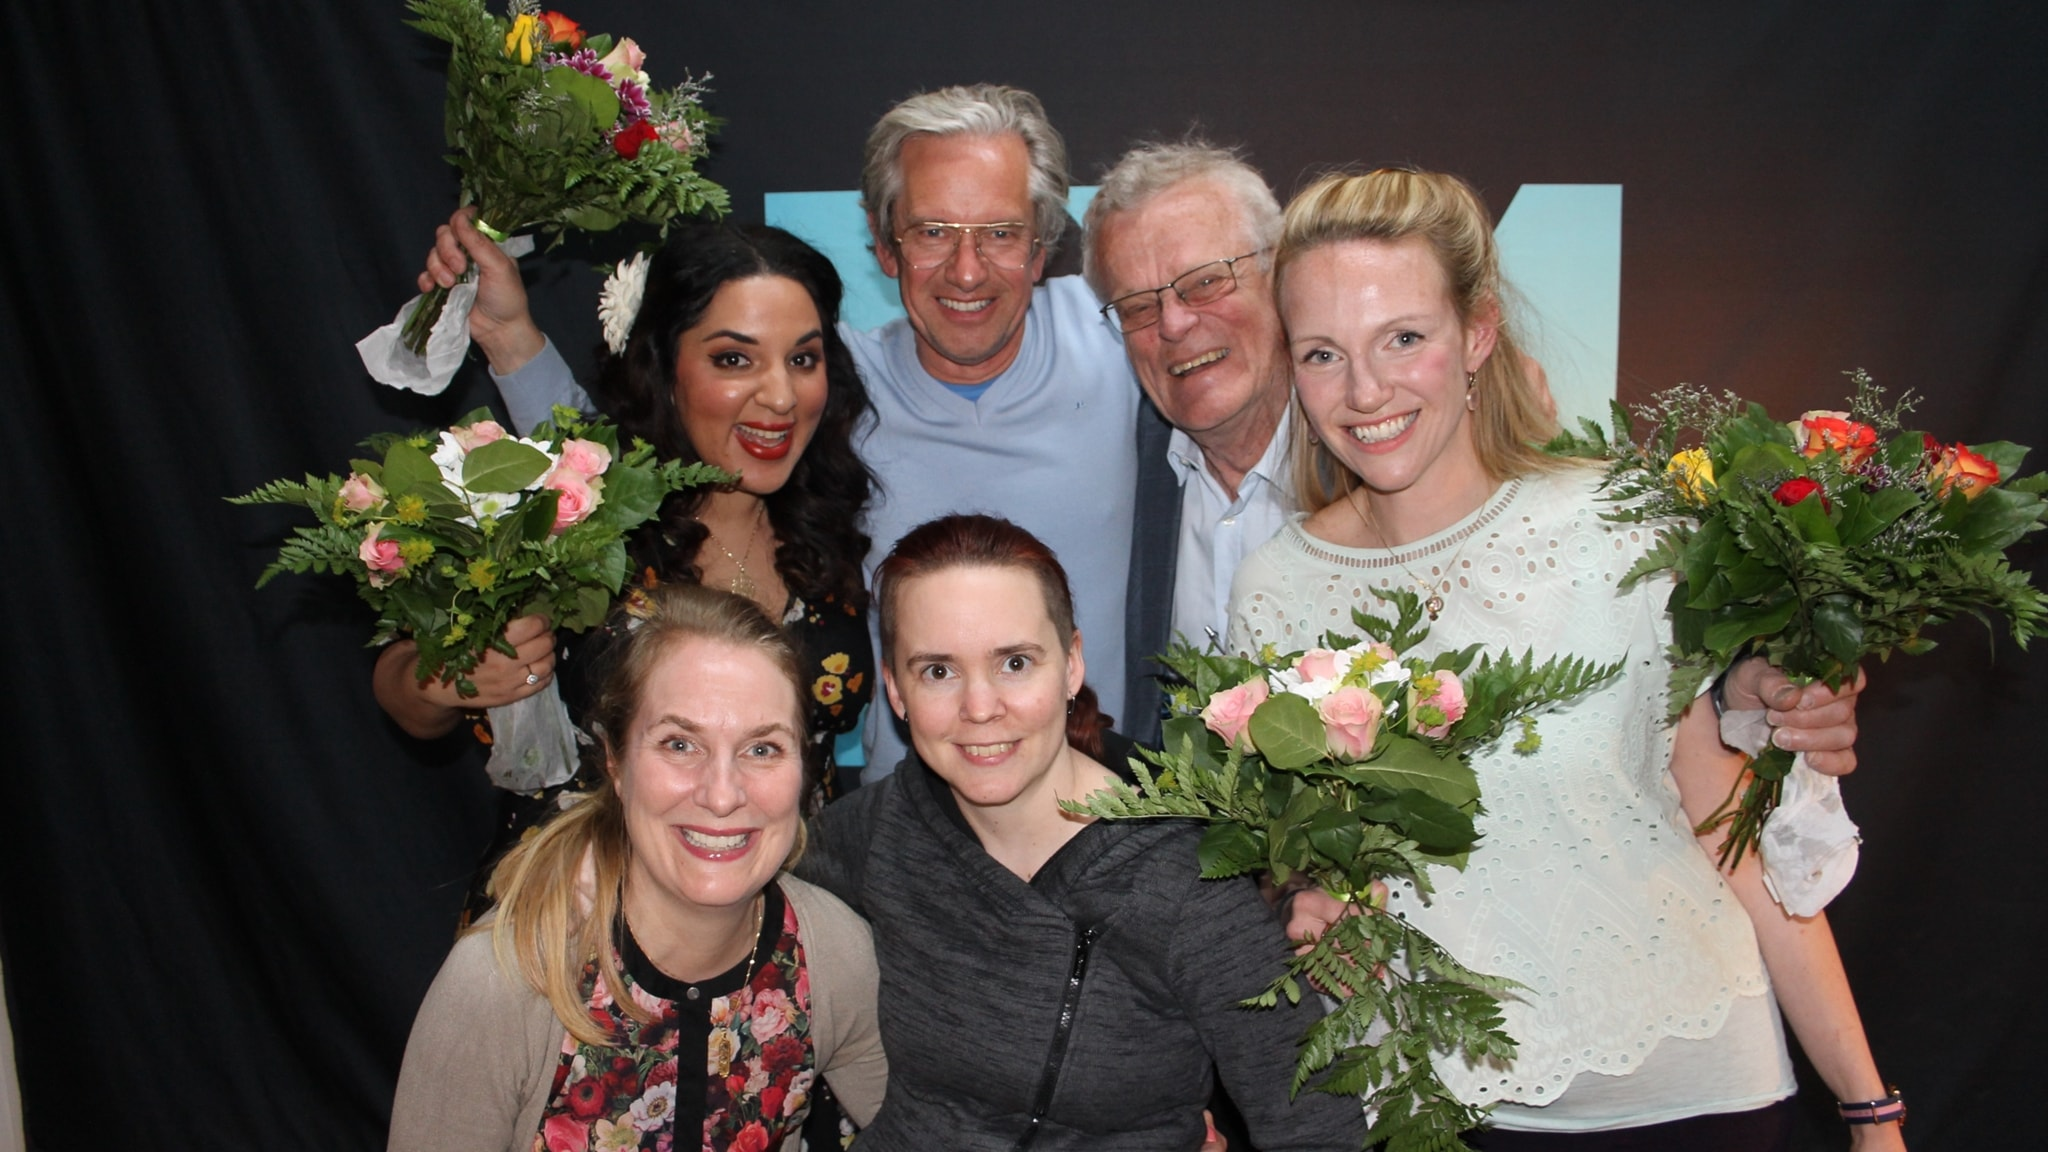 Tara Moshizi, Björn Eriksson, Tove Meyer och Anders G Carlsson!